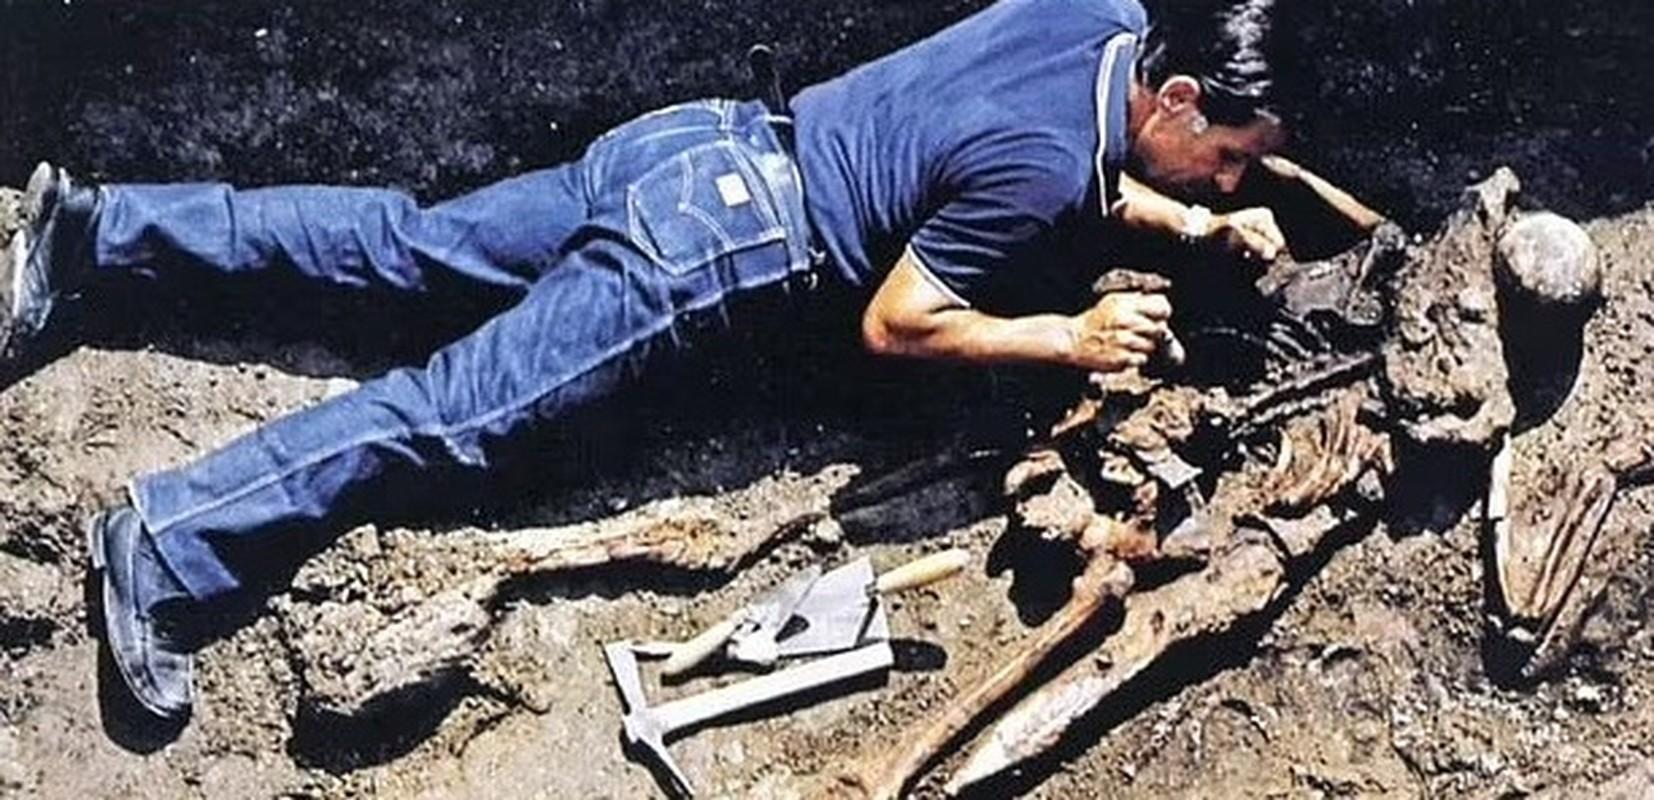 Bi mat nguoi hung trong tham kich nui lua Vesuvius gan 2.000 nam truoc-Hinh-2